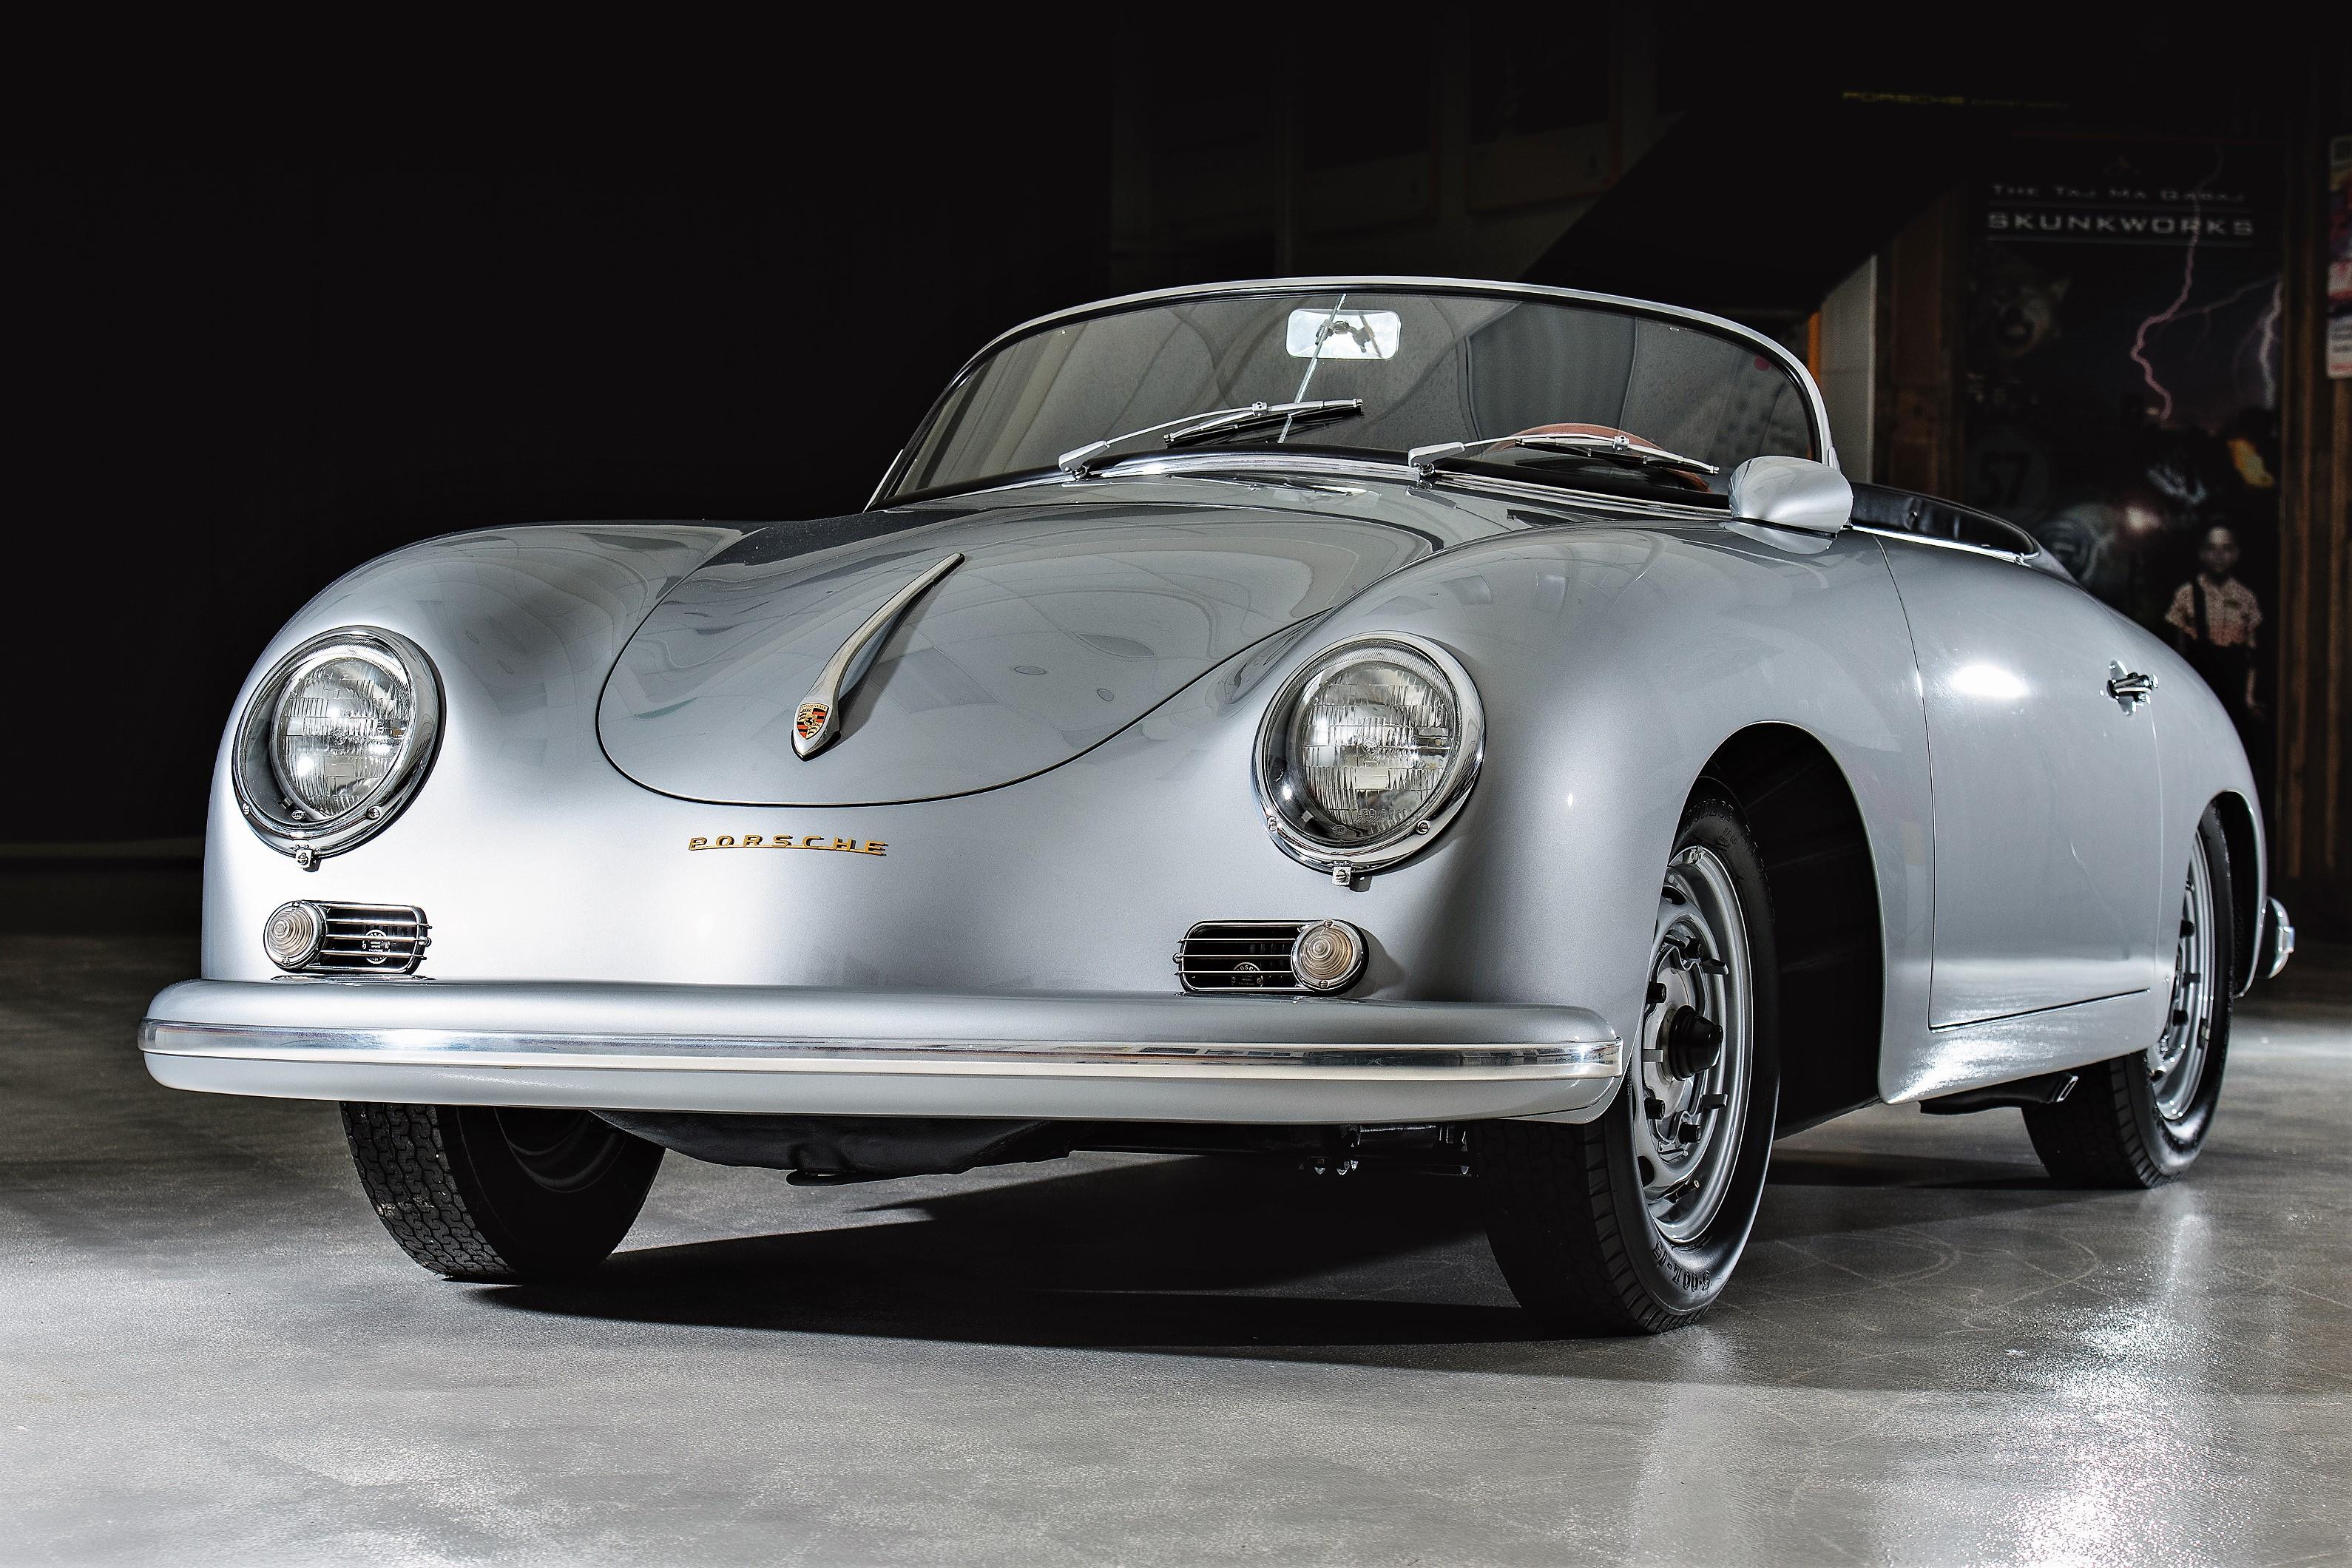 Taj Ma Garaj auction presents bonanza of rare Porsche, VW cars